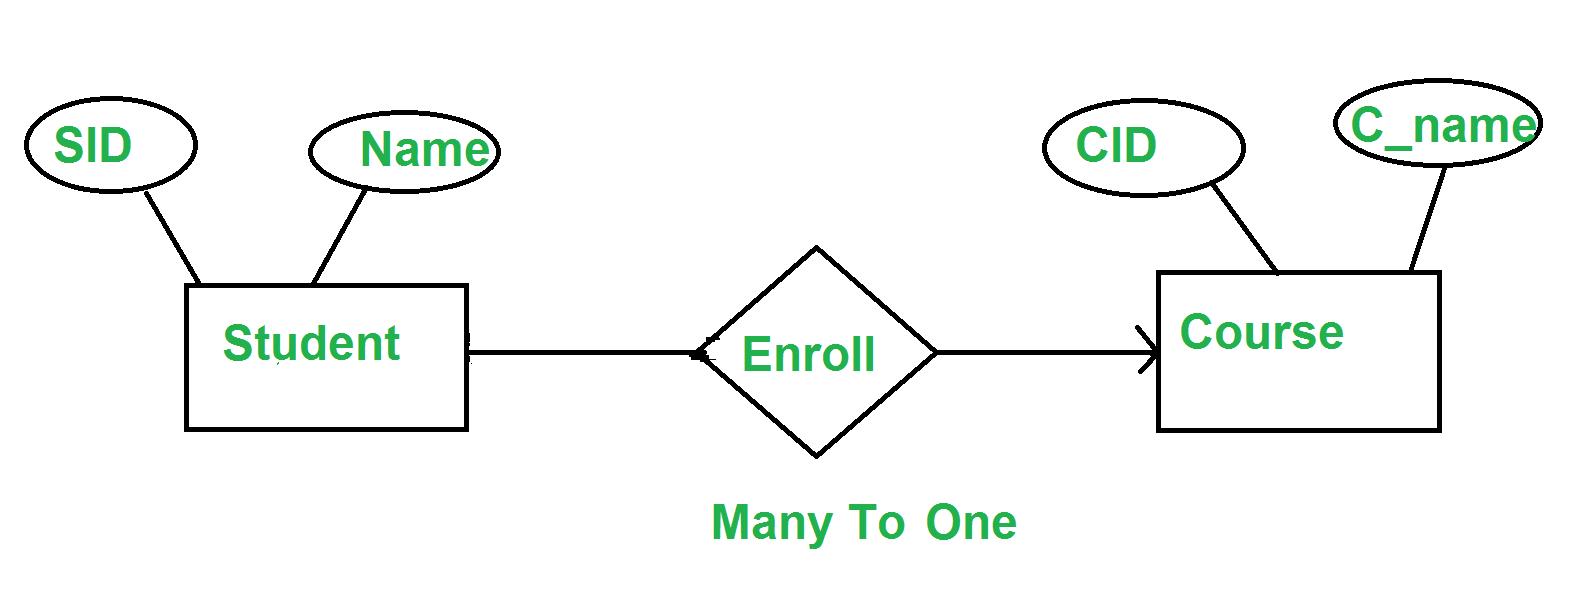 Minimization Of Er Diagrams - Geeksforgeeks pertaining to Total Participation Er Diagram